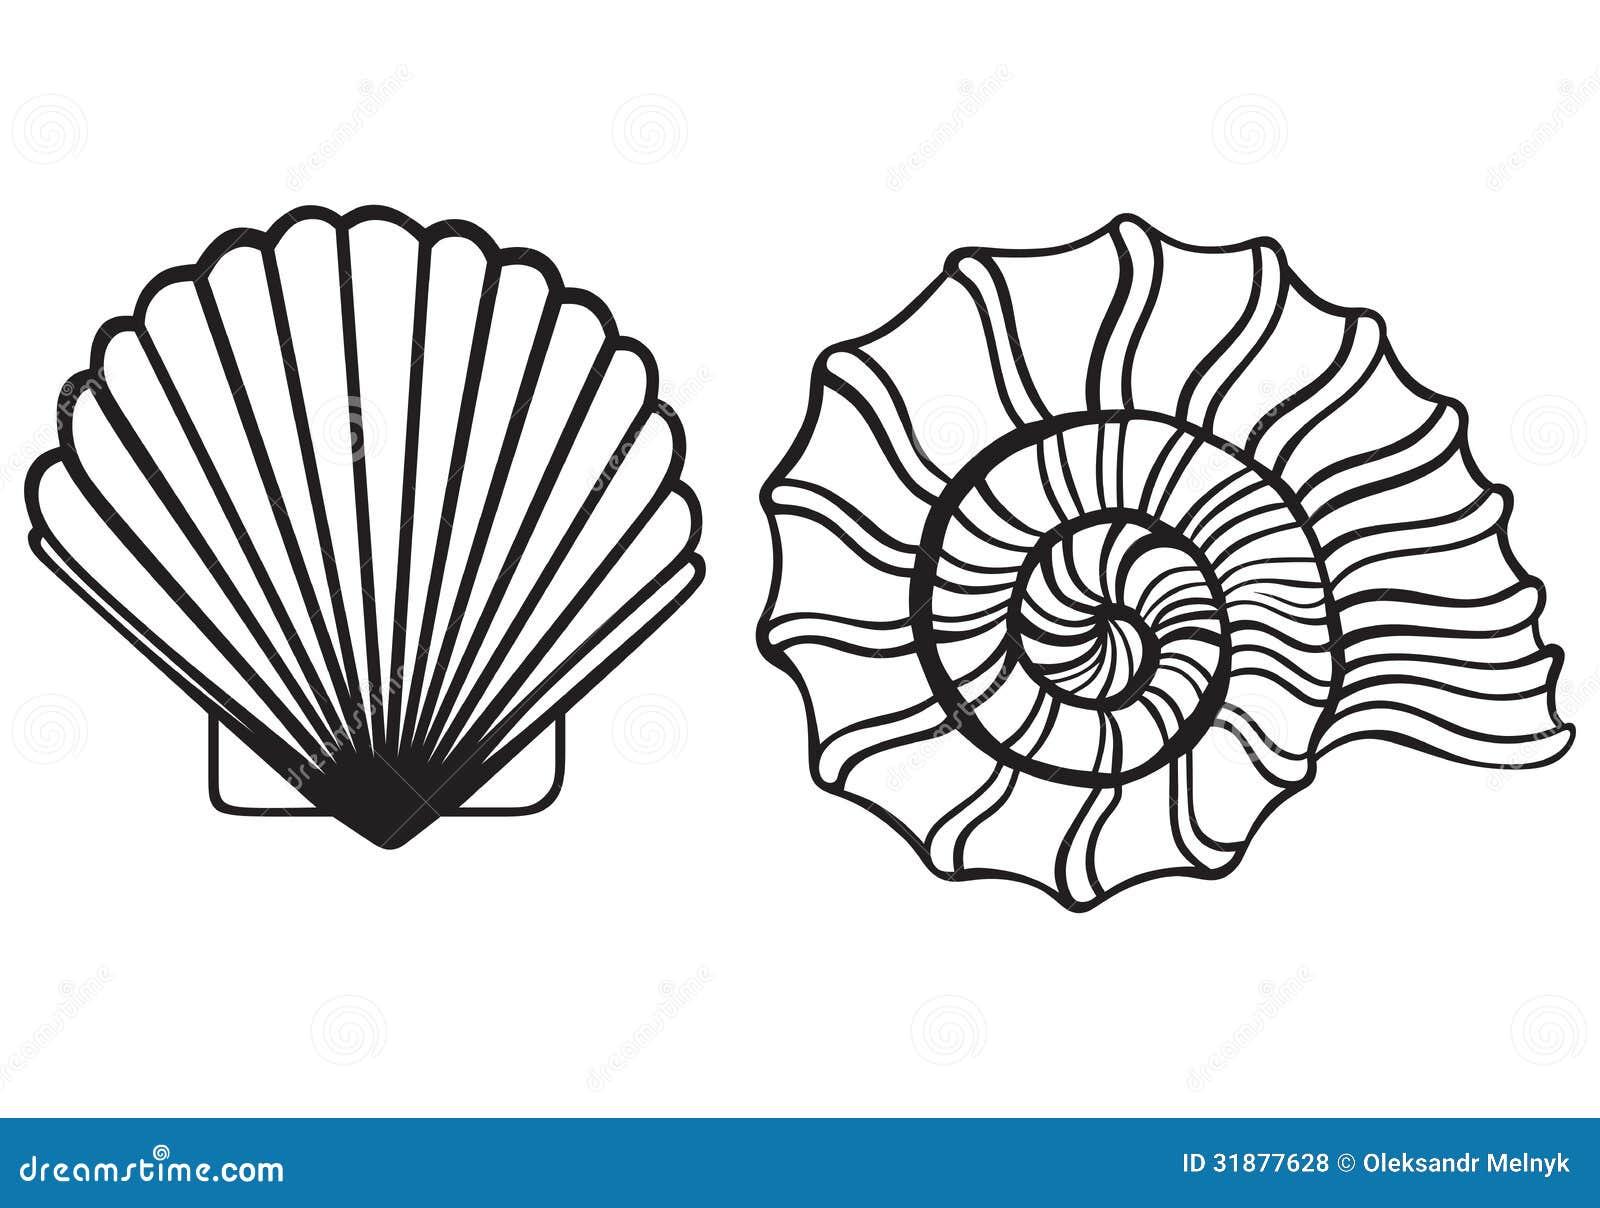 Sea Shells Royalty Free Stock Photos Image 31877628